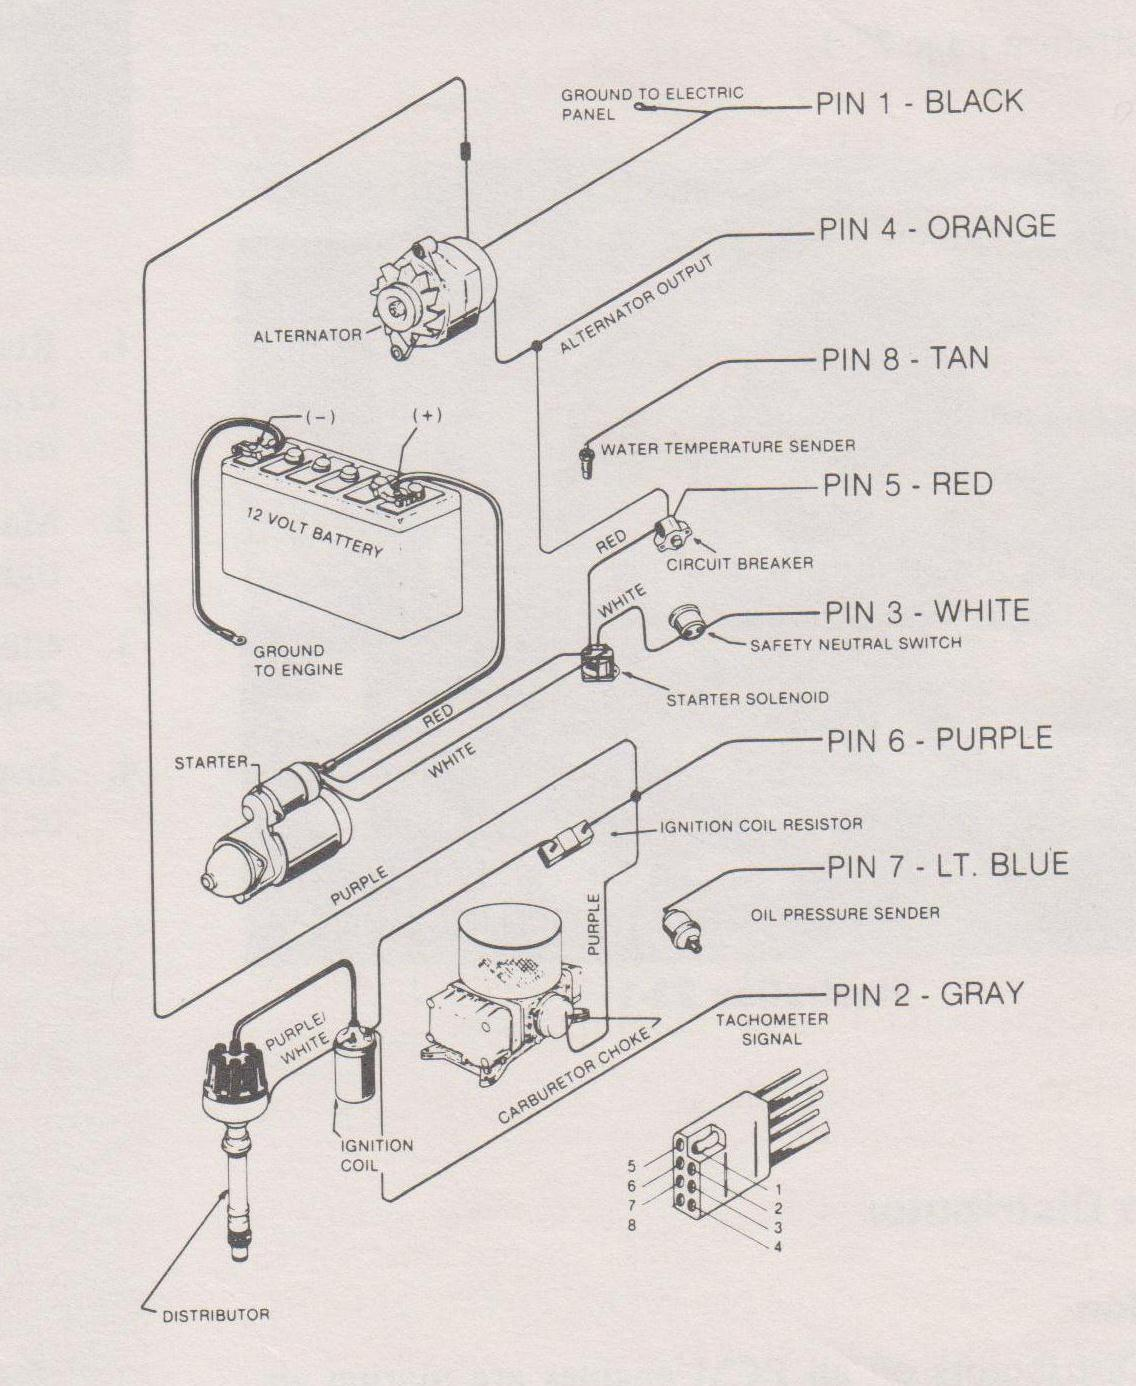 hight resolution of 2000 kia rio engine diagram wiring librarykia pride engine plug diagram wiring diagram u2022